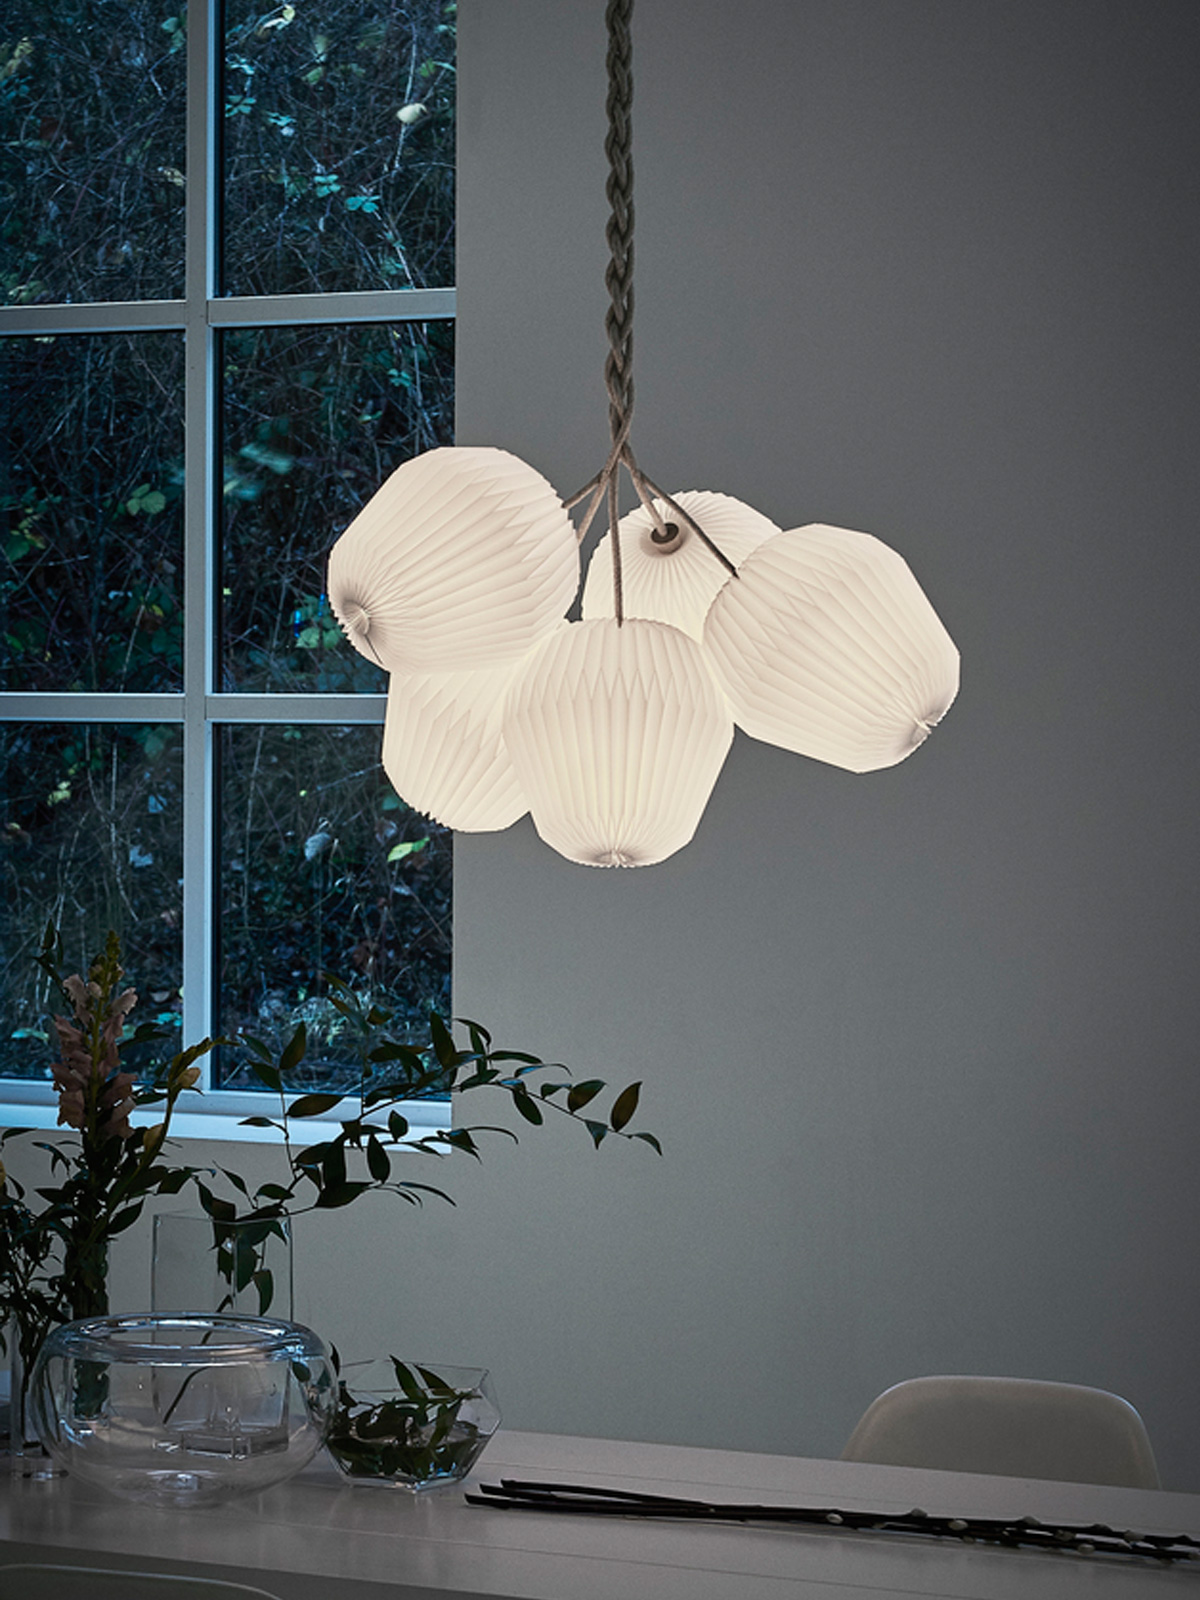 Designort Blog: Mehrflammige Leuchten The Bouquet Le Klint 130 DesignOrt Onlineshop Lampen Berlin Designerleuchten